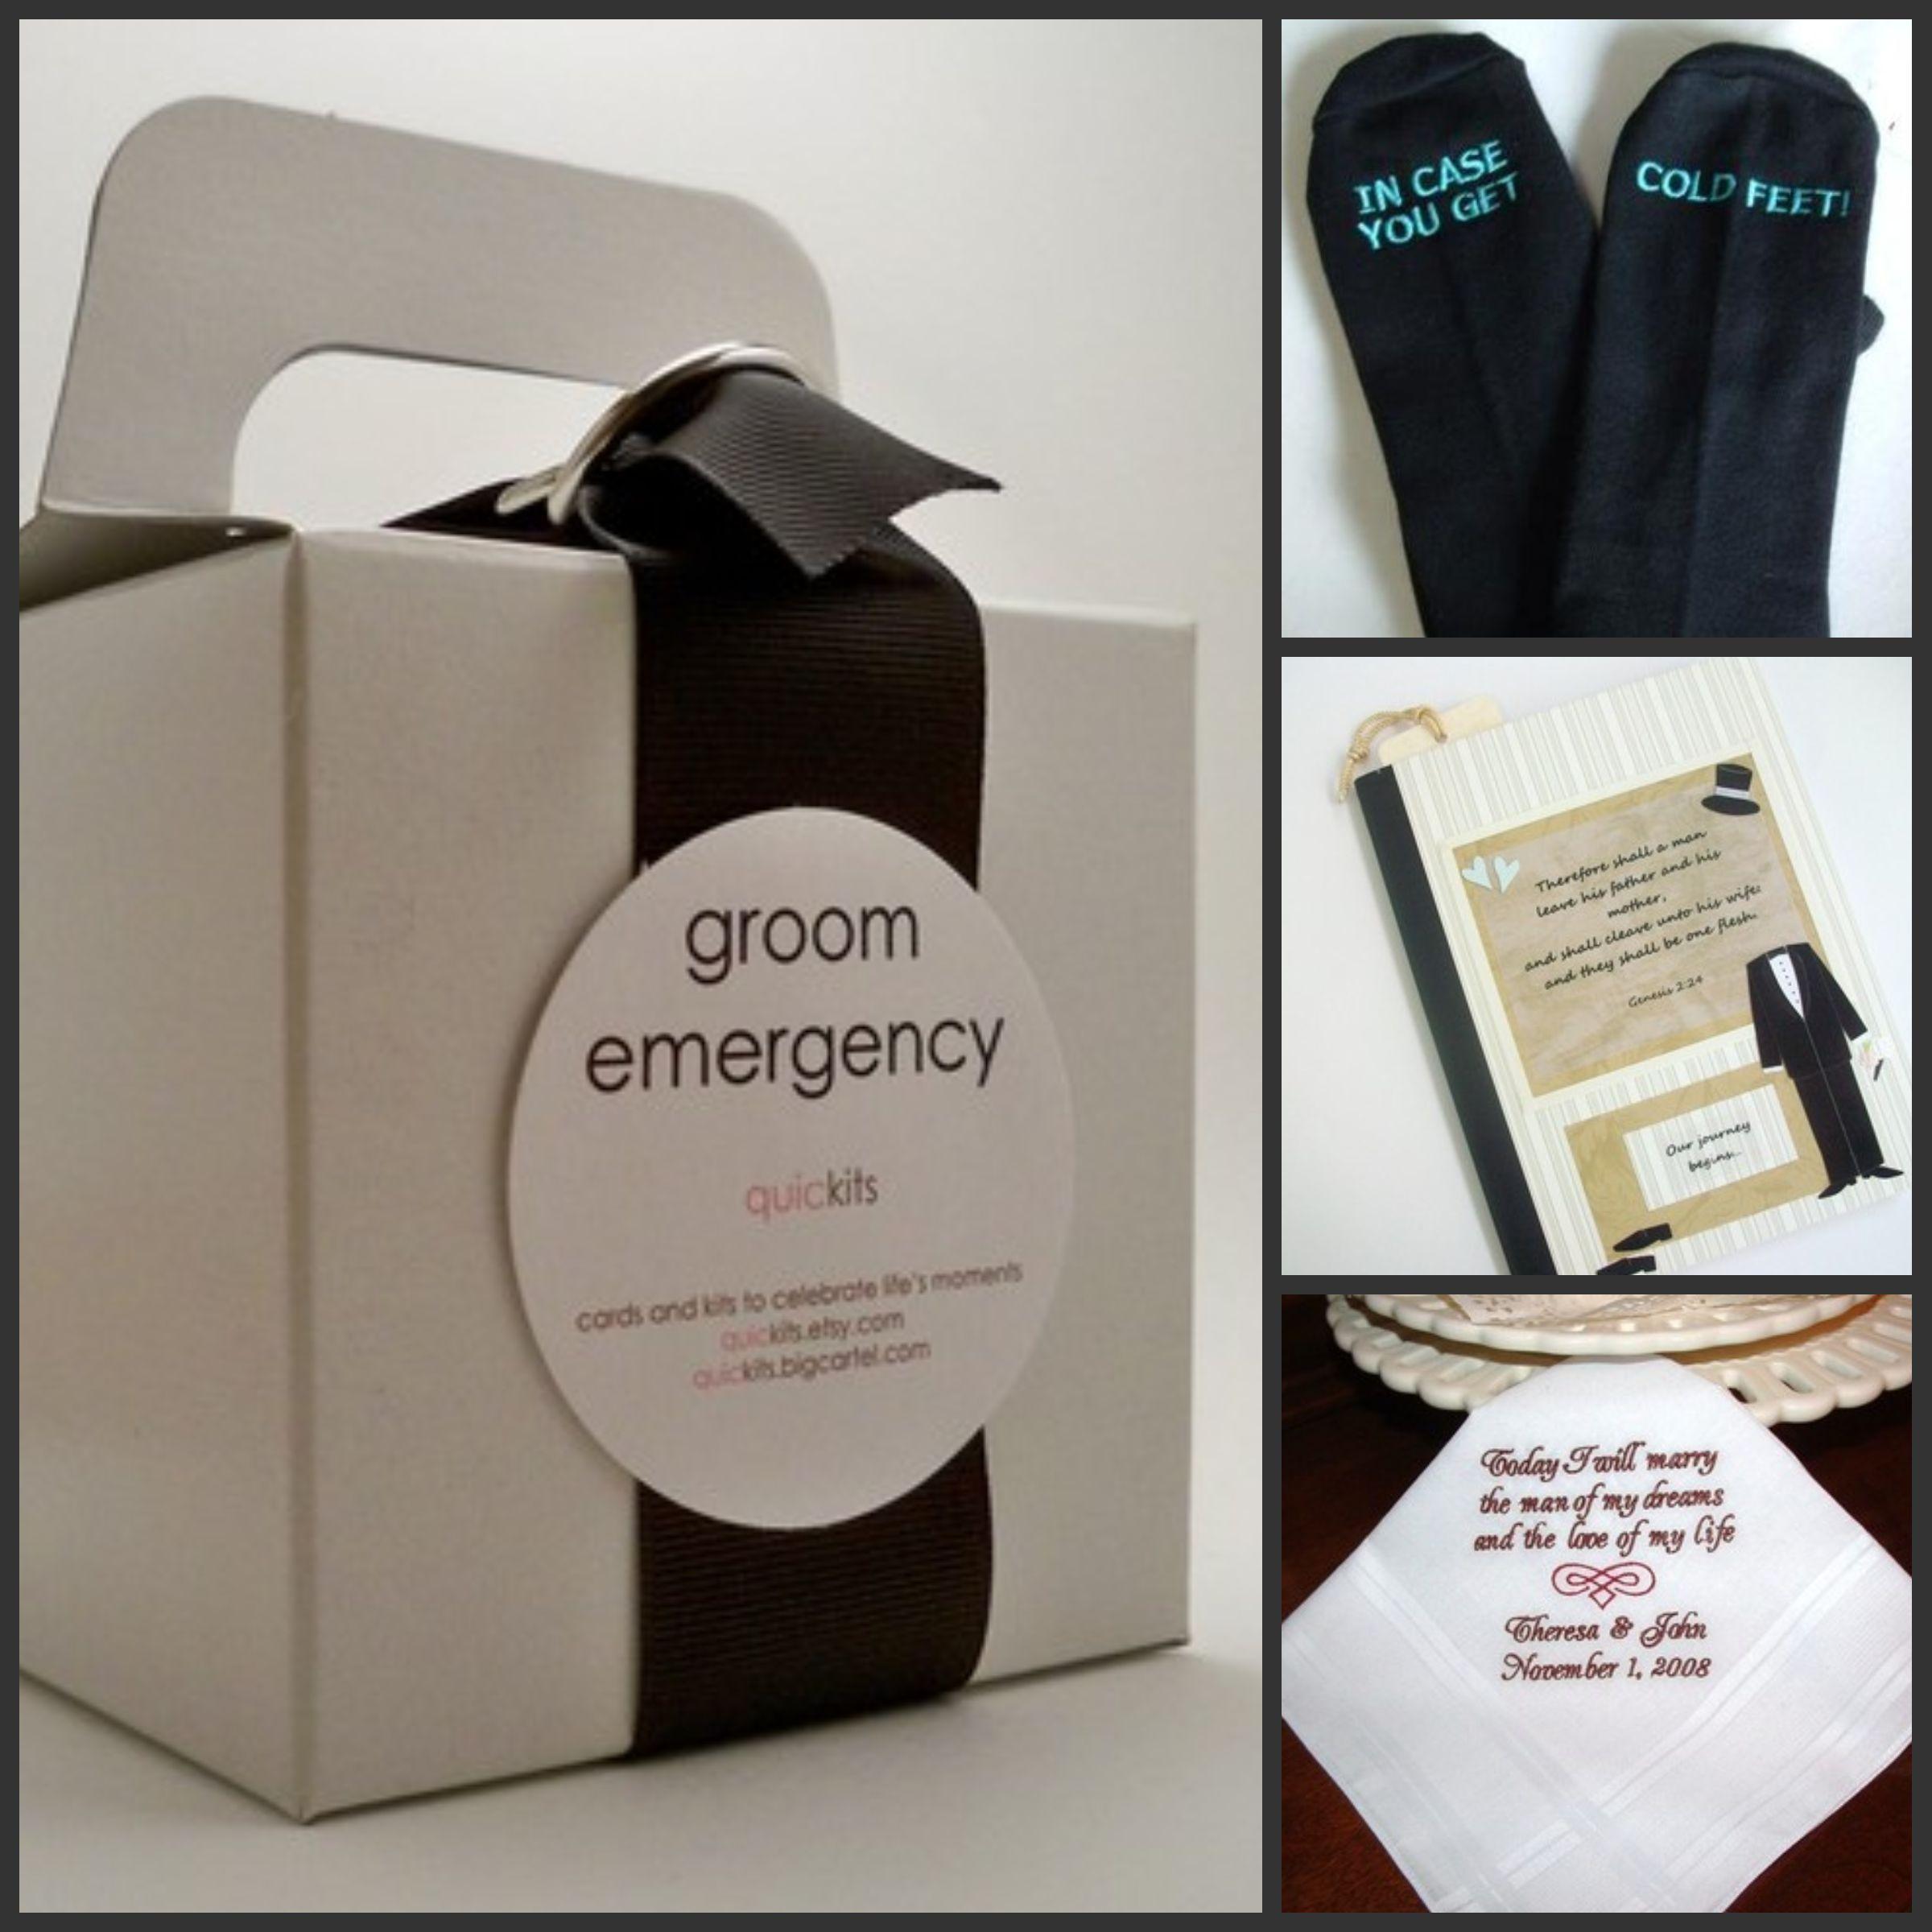 wedding gift for groom Bridal Gift Groom Gift Ideas From Groomsmen Bride Groom Wedding